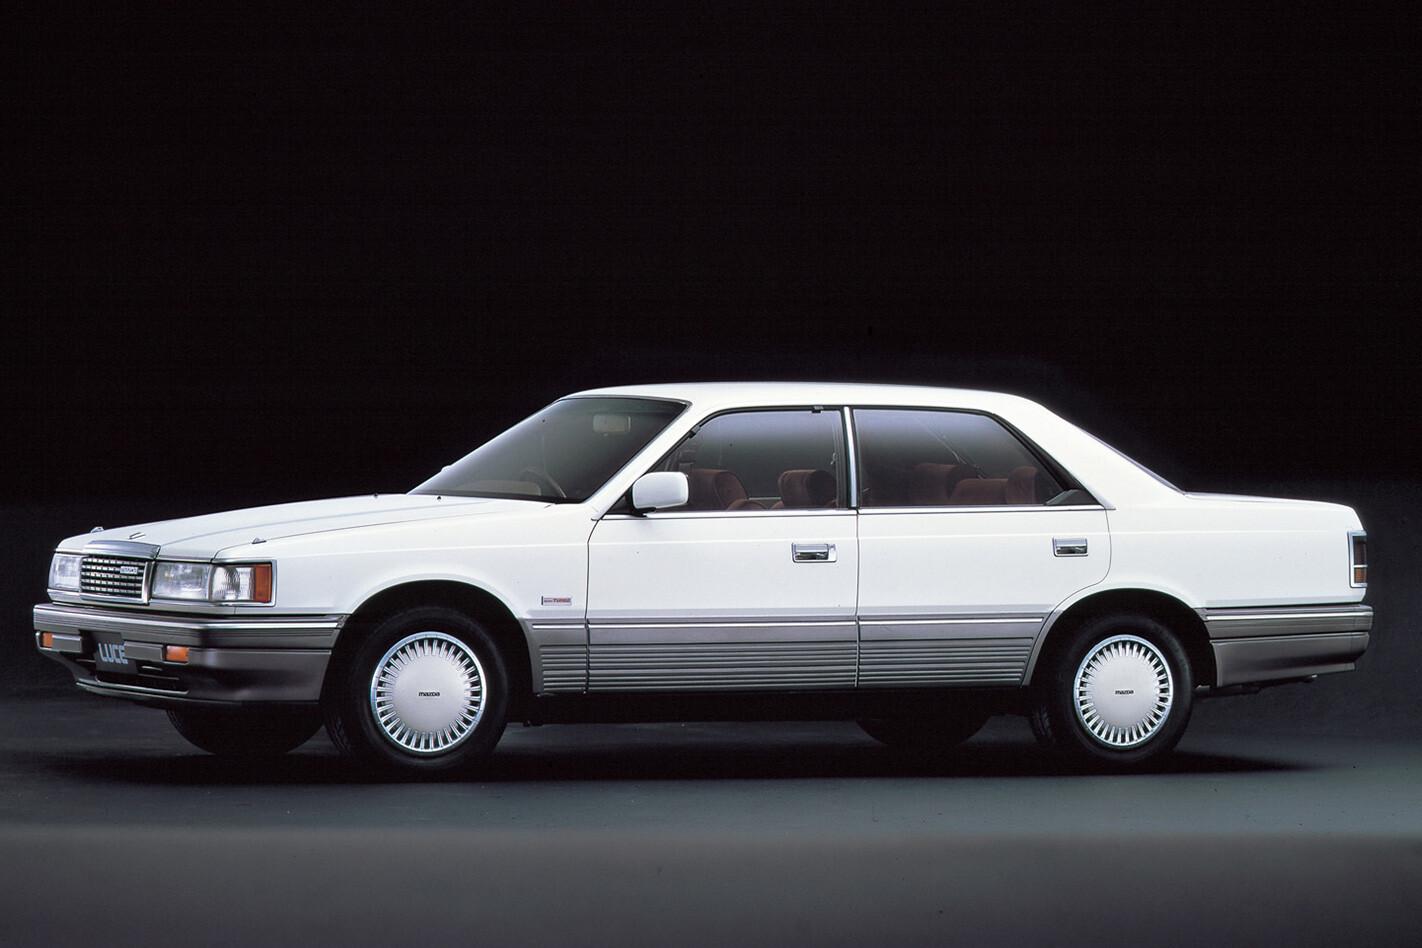 Mazda Turbo Luce Jpg